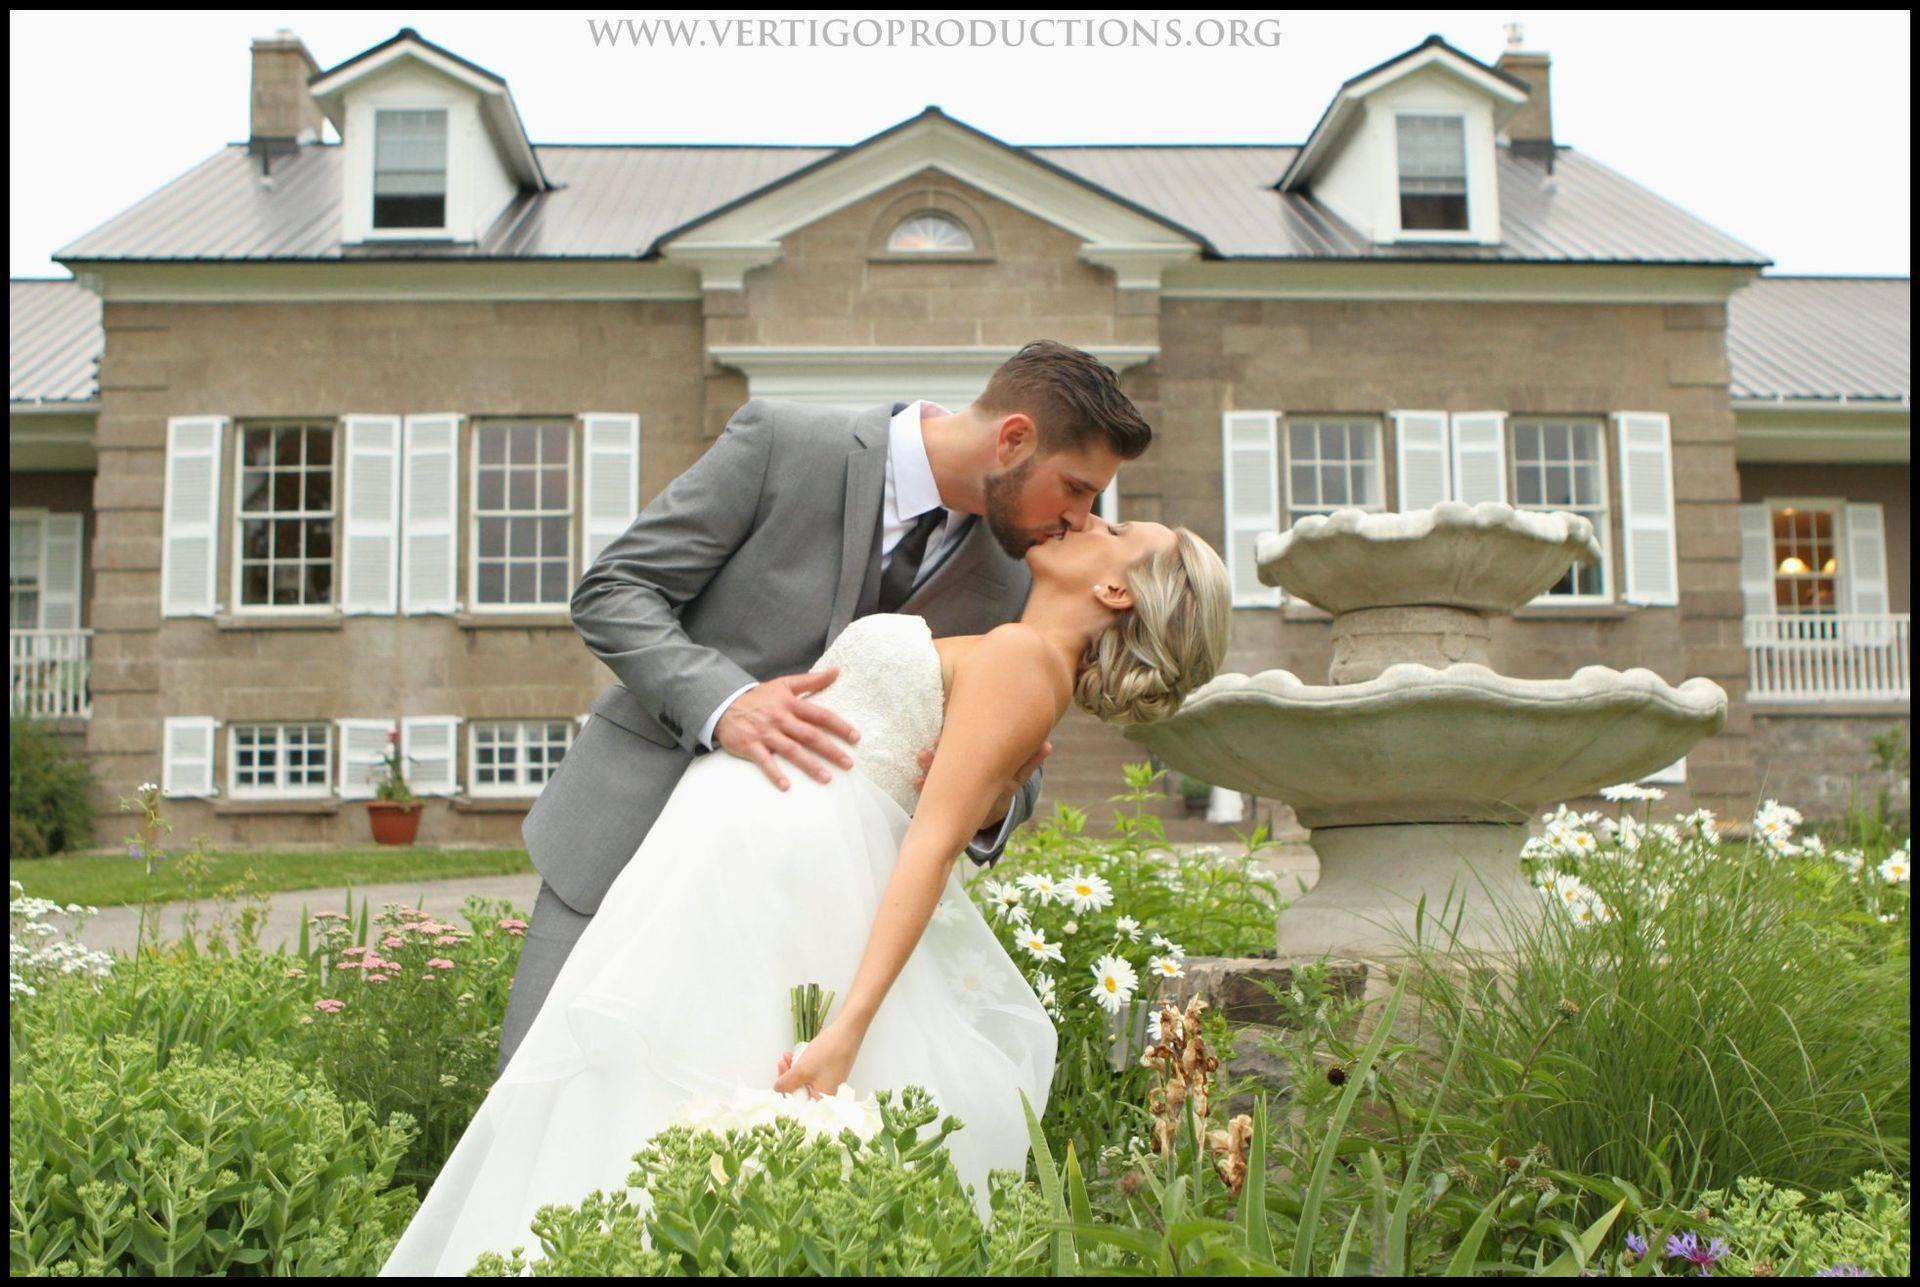 Brockville and Prescott wedding photographer, Maplehurst Manor, vertigo productions photography